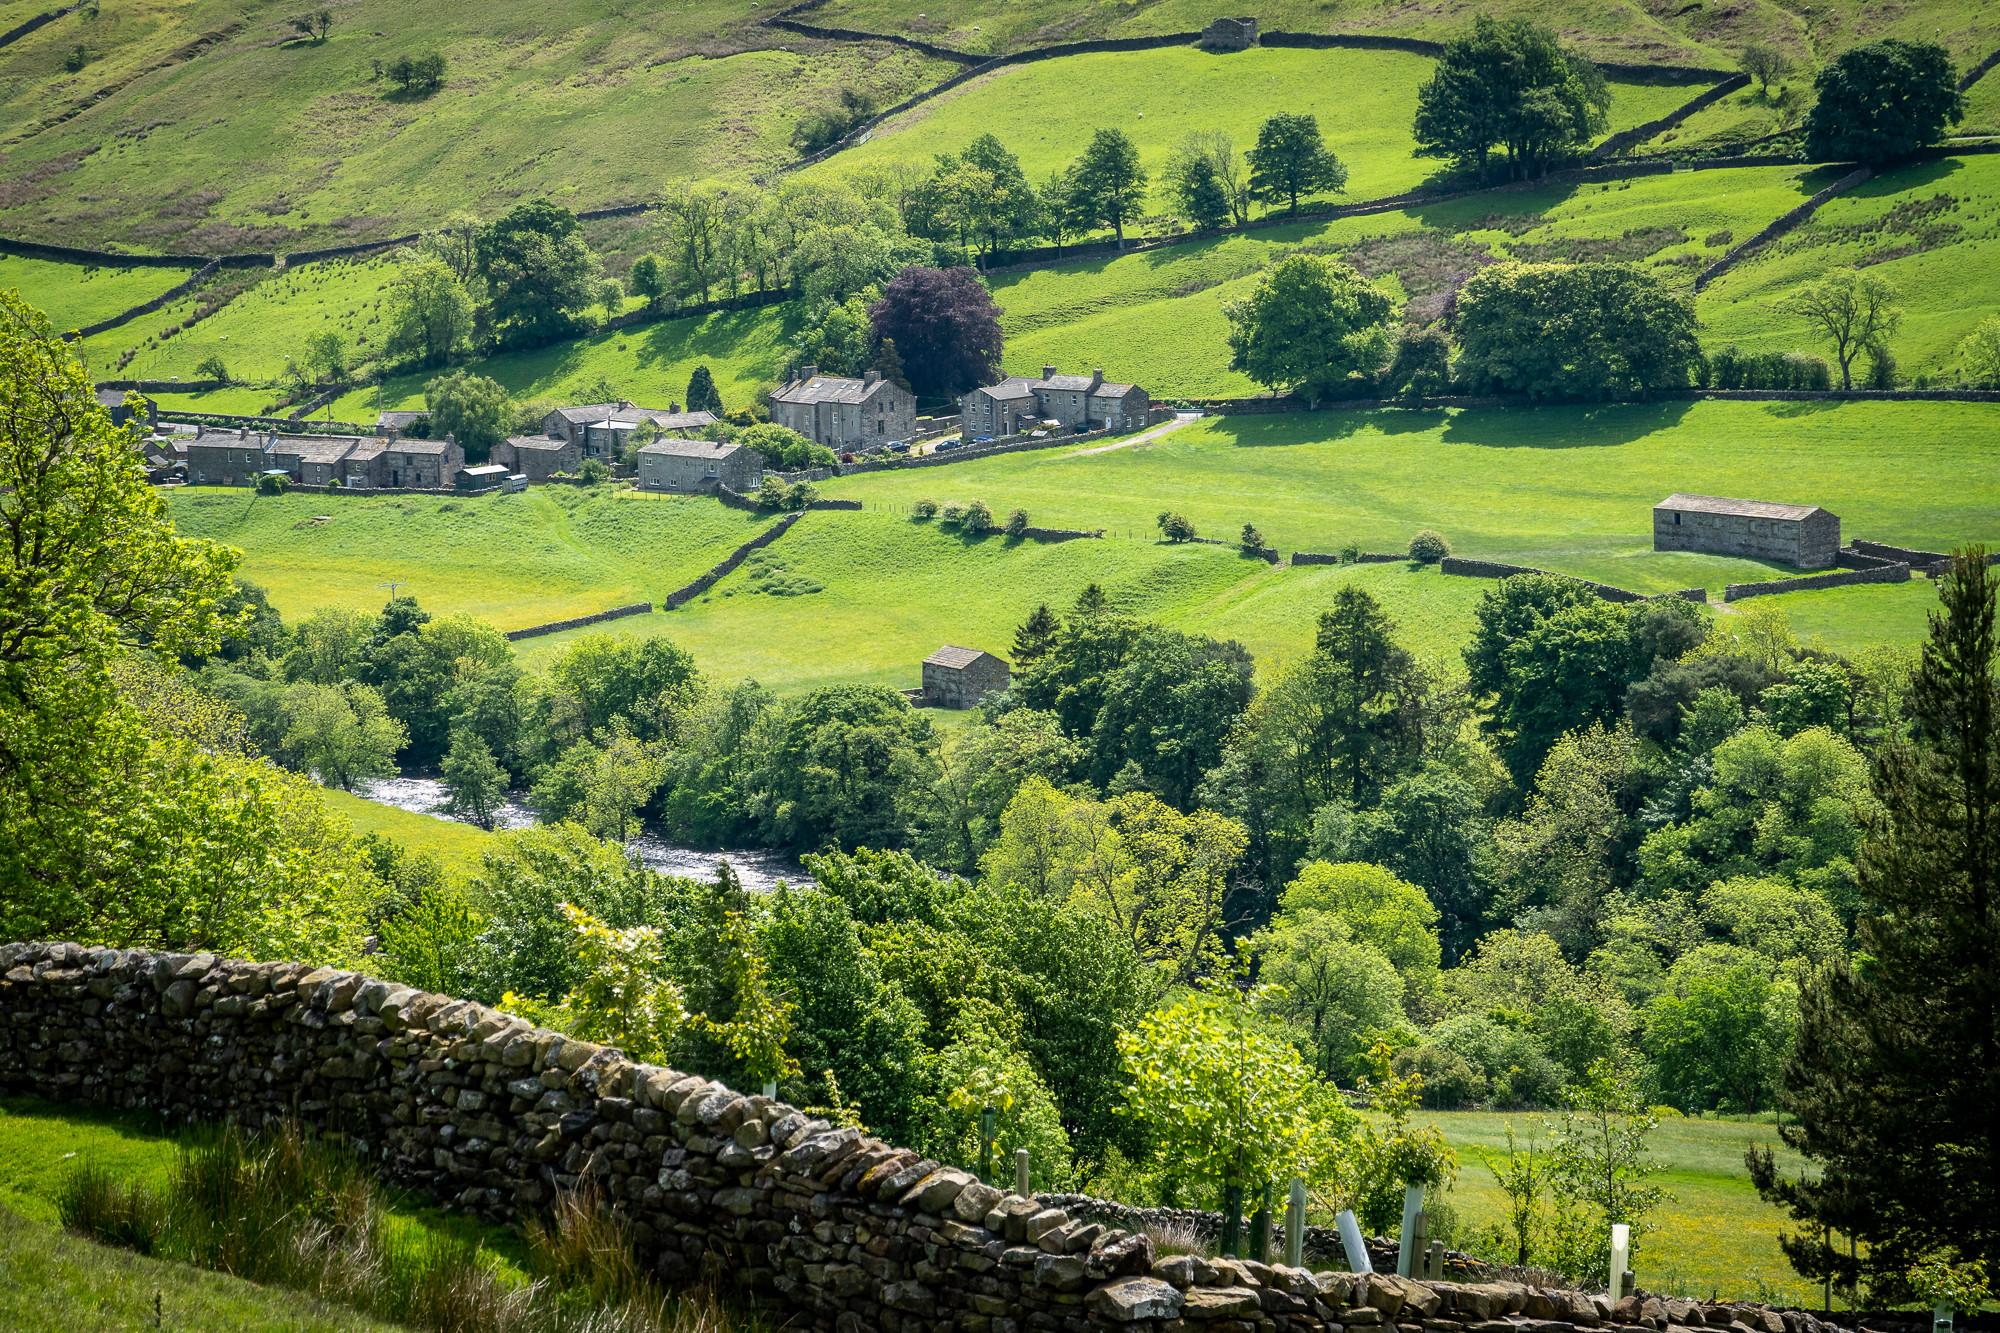 Gunnerside, Swaledale, Yorkshire Dales by Bob Radlinski.jpg